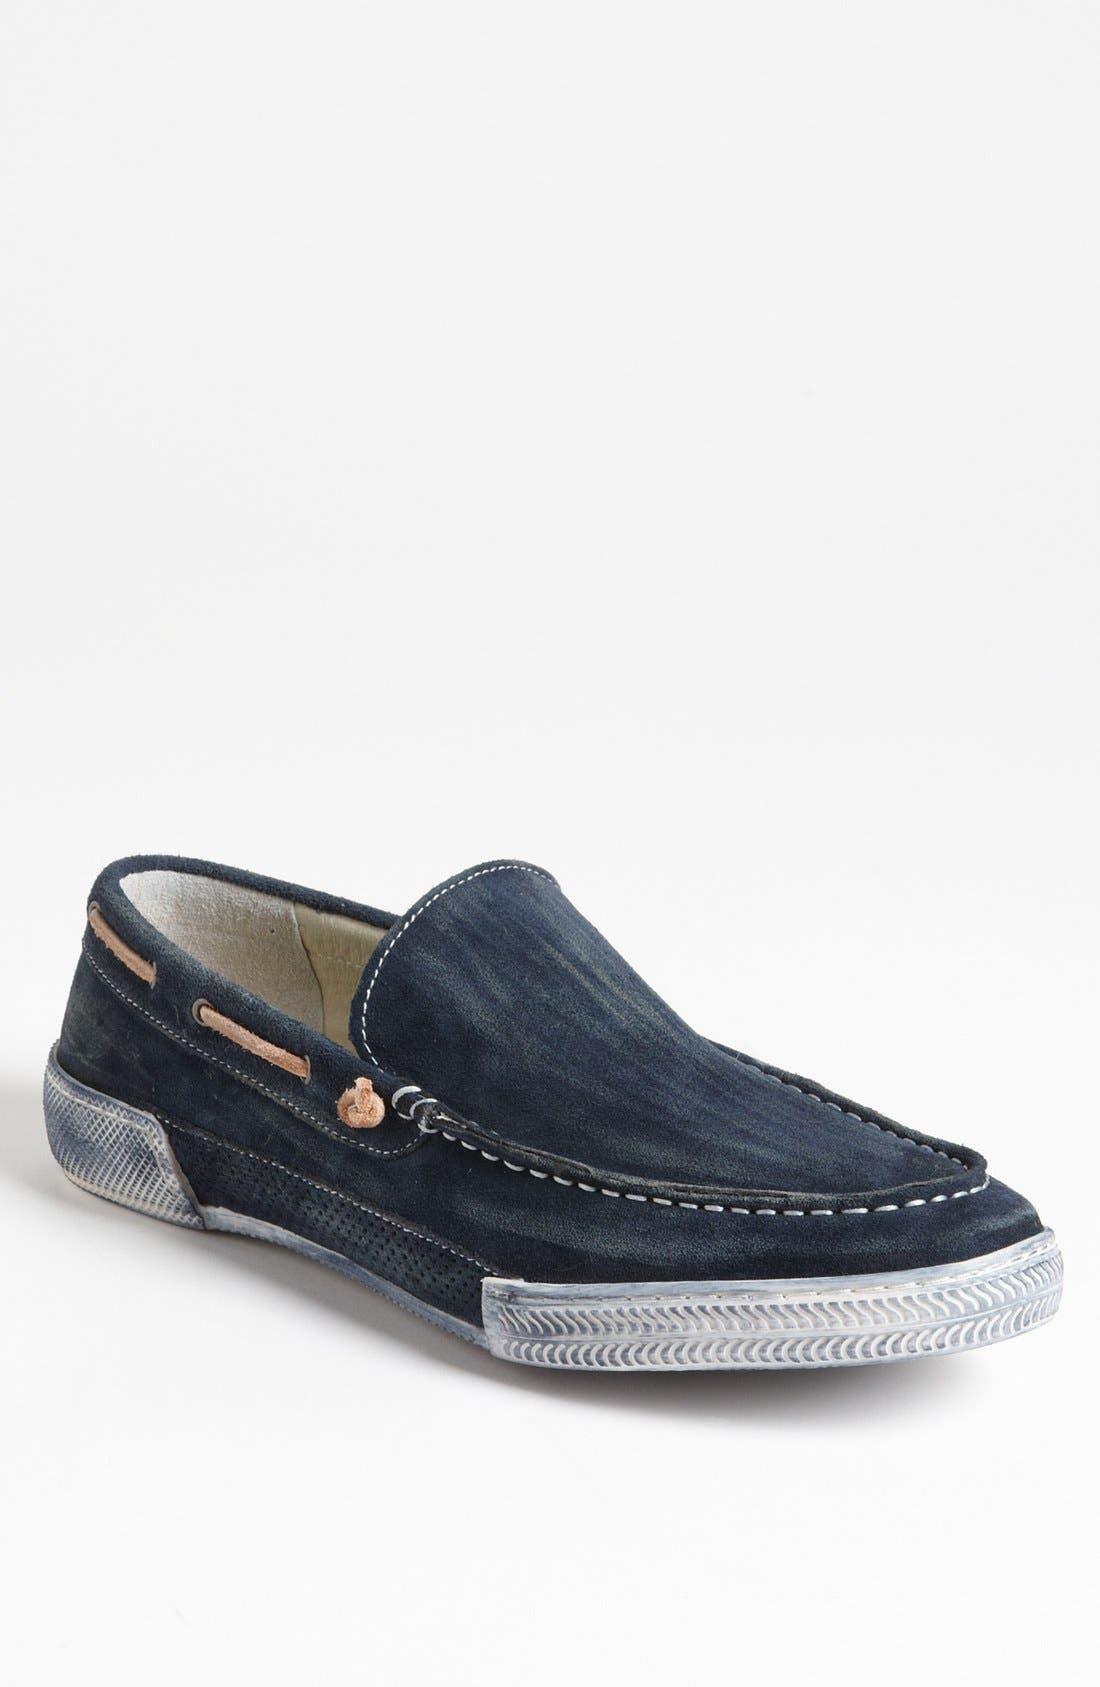 Main Image - Rogue 'Rascal' Boat Shoe